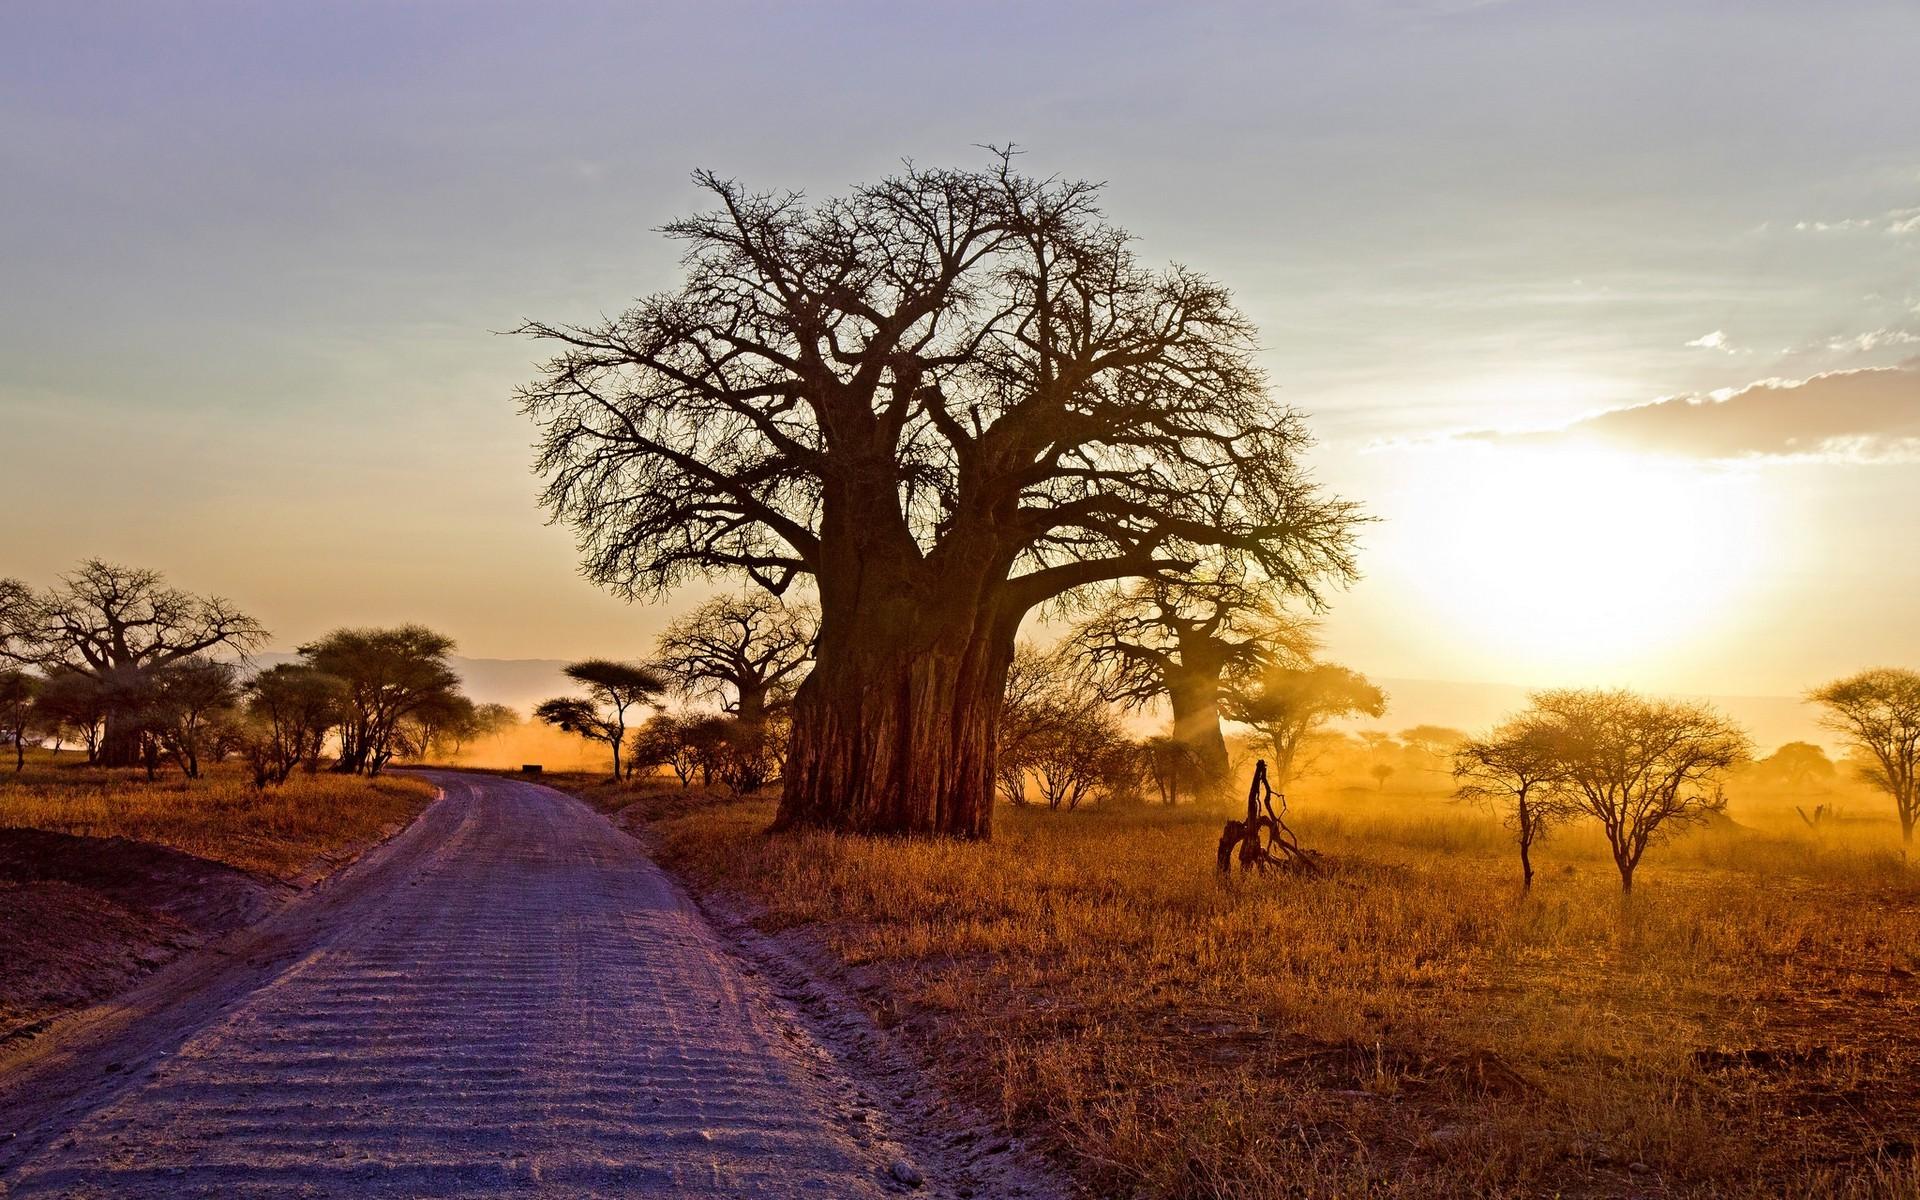 1920x1200 Px Africa Baobab Trees Dirt Road Dry Grass Landscape Nature Shrubs Sunlight Sunset Tanzania